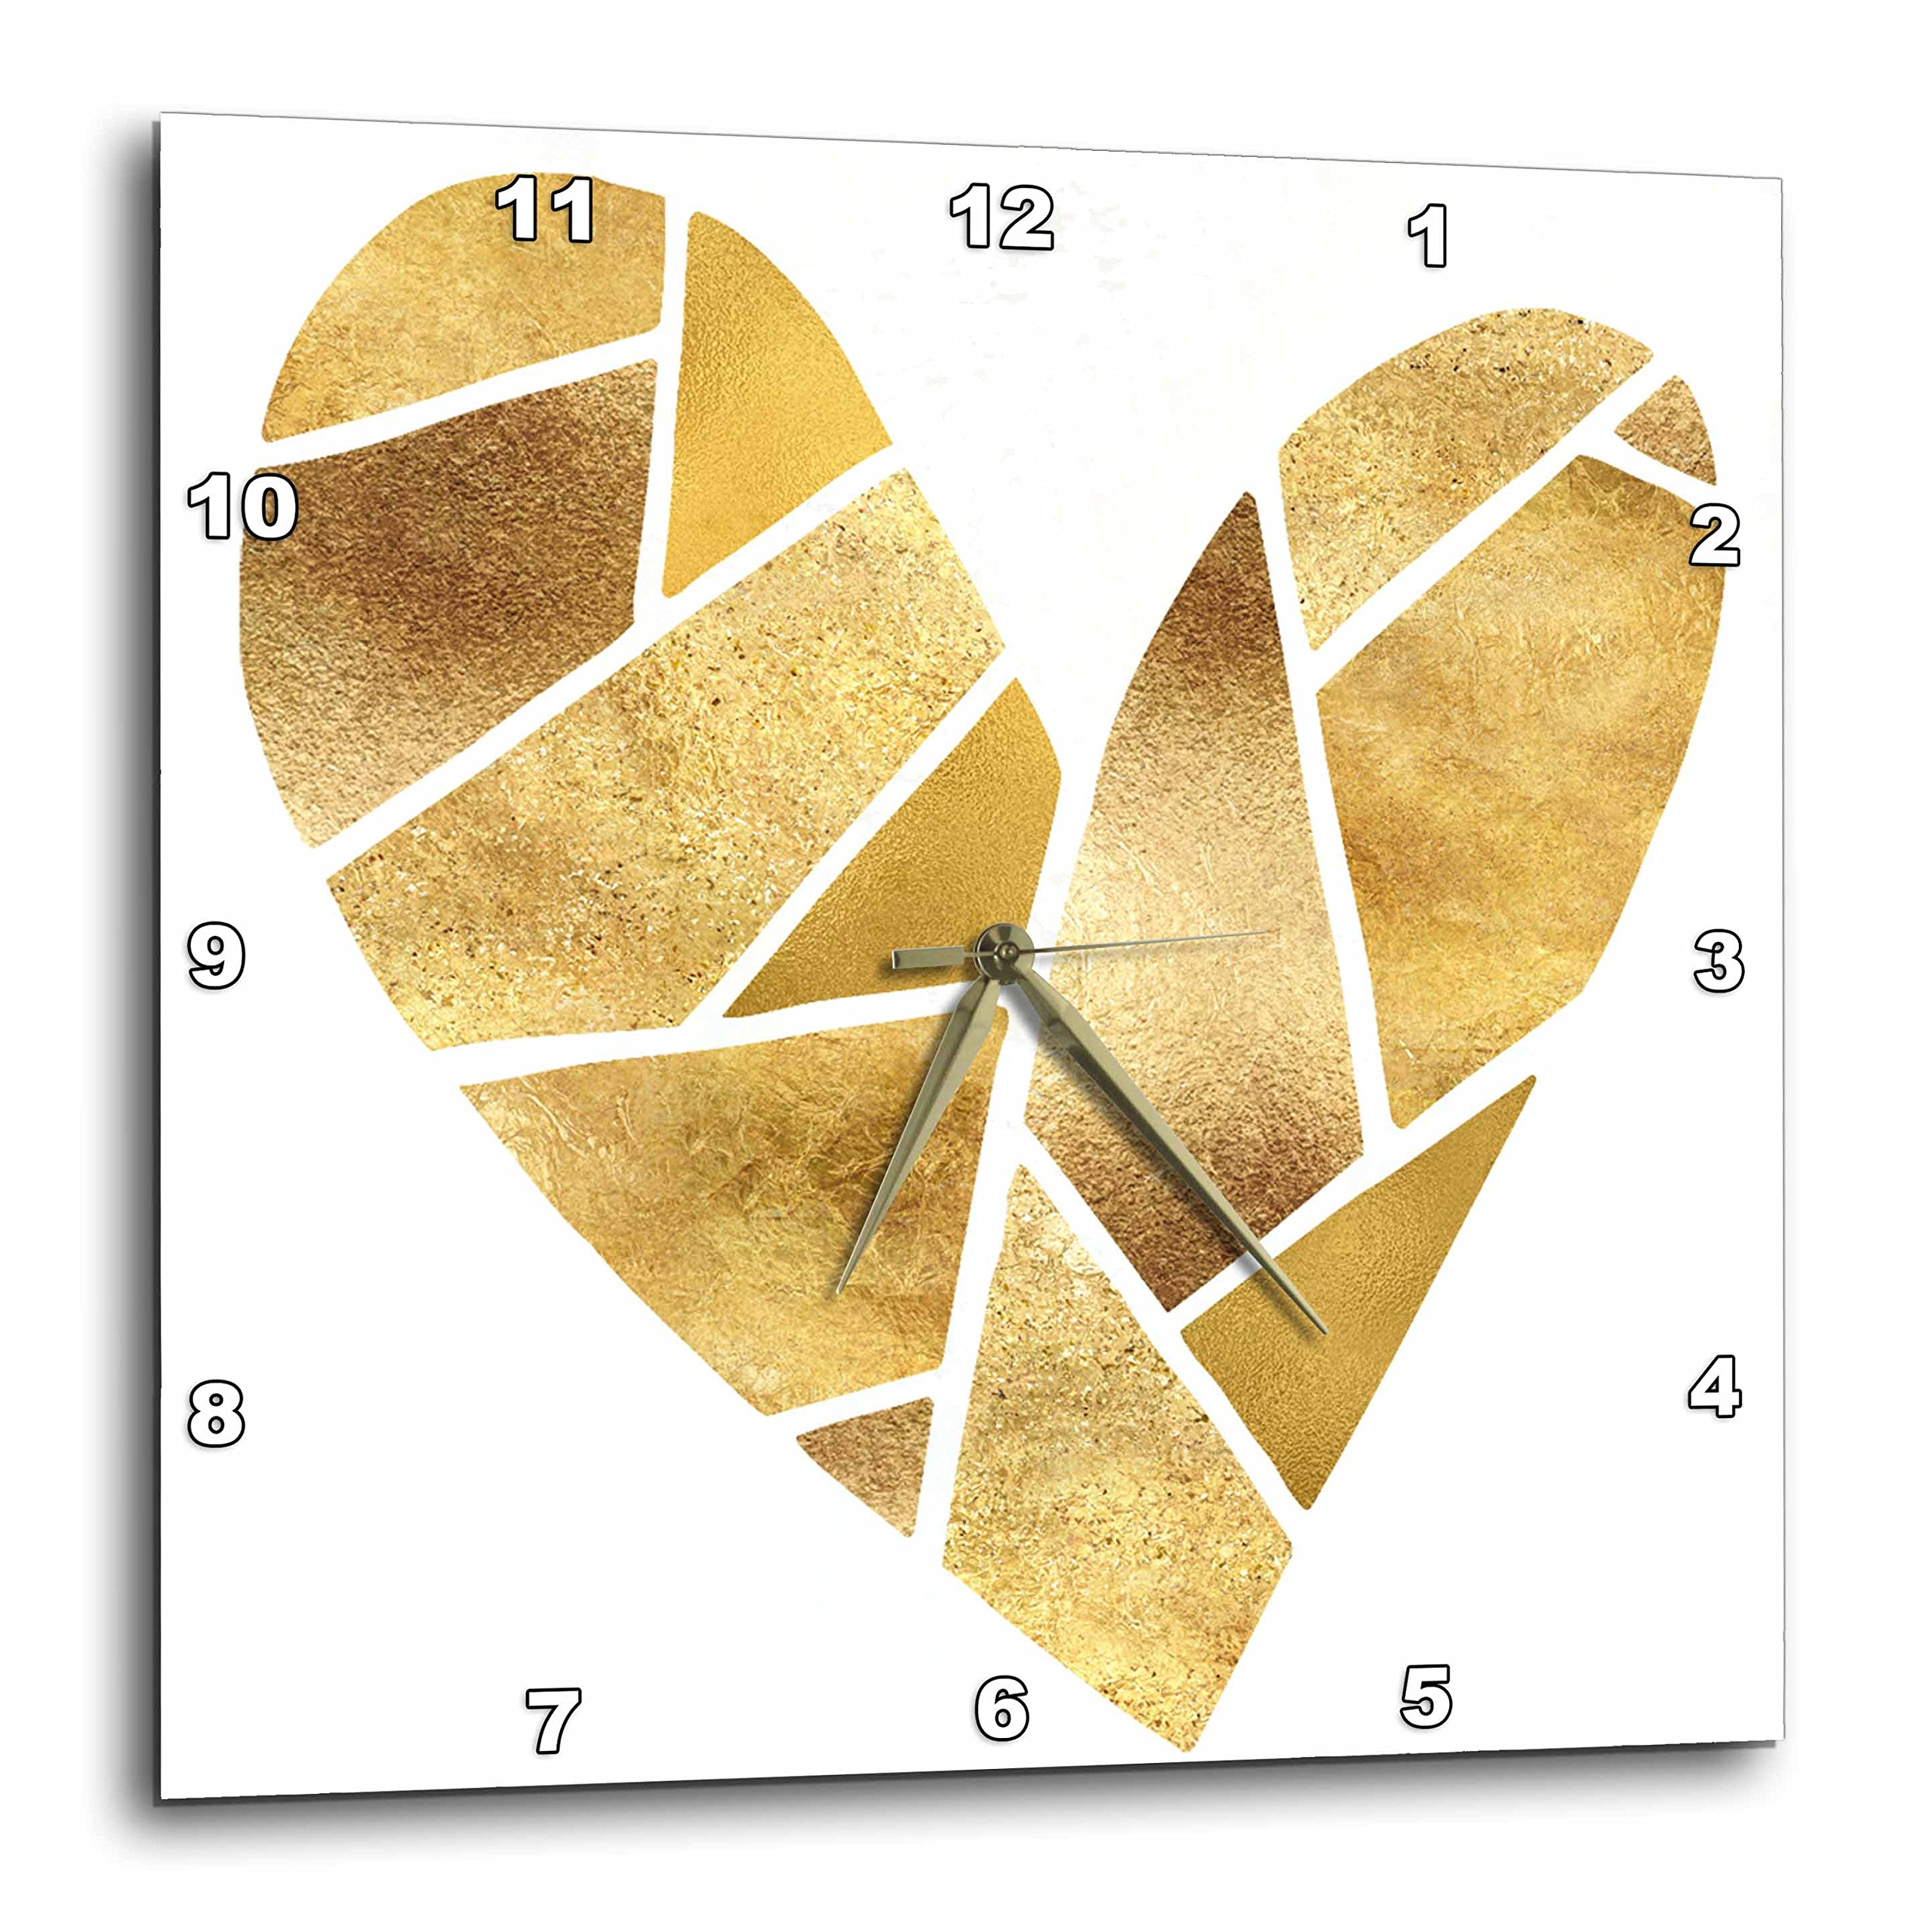 3dRose PS Glam - Gold Pieces Glitz Glam Heart - 10x10 Wall Clock (dpp_280761_1)